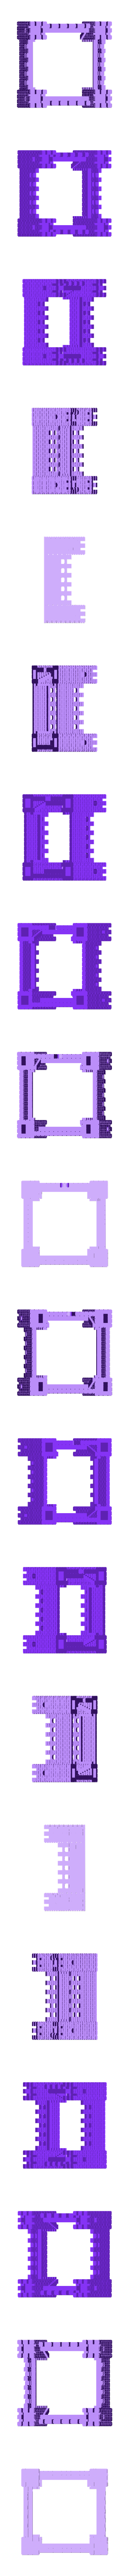 castle.stl Download STL file Castle • Model to 3D print, eAgent